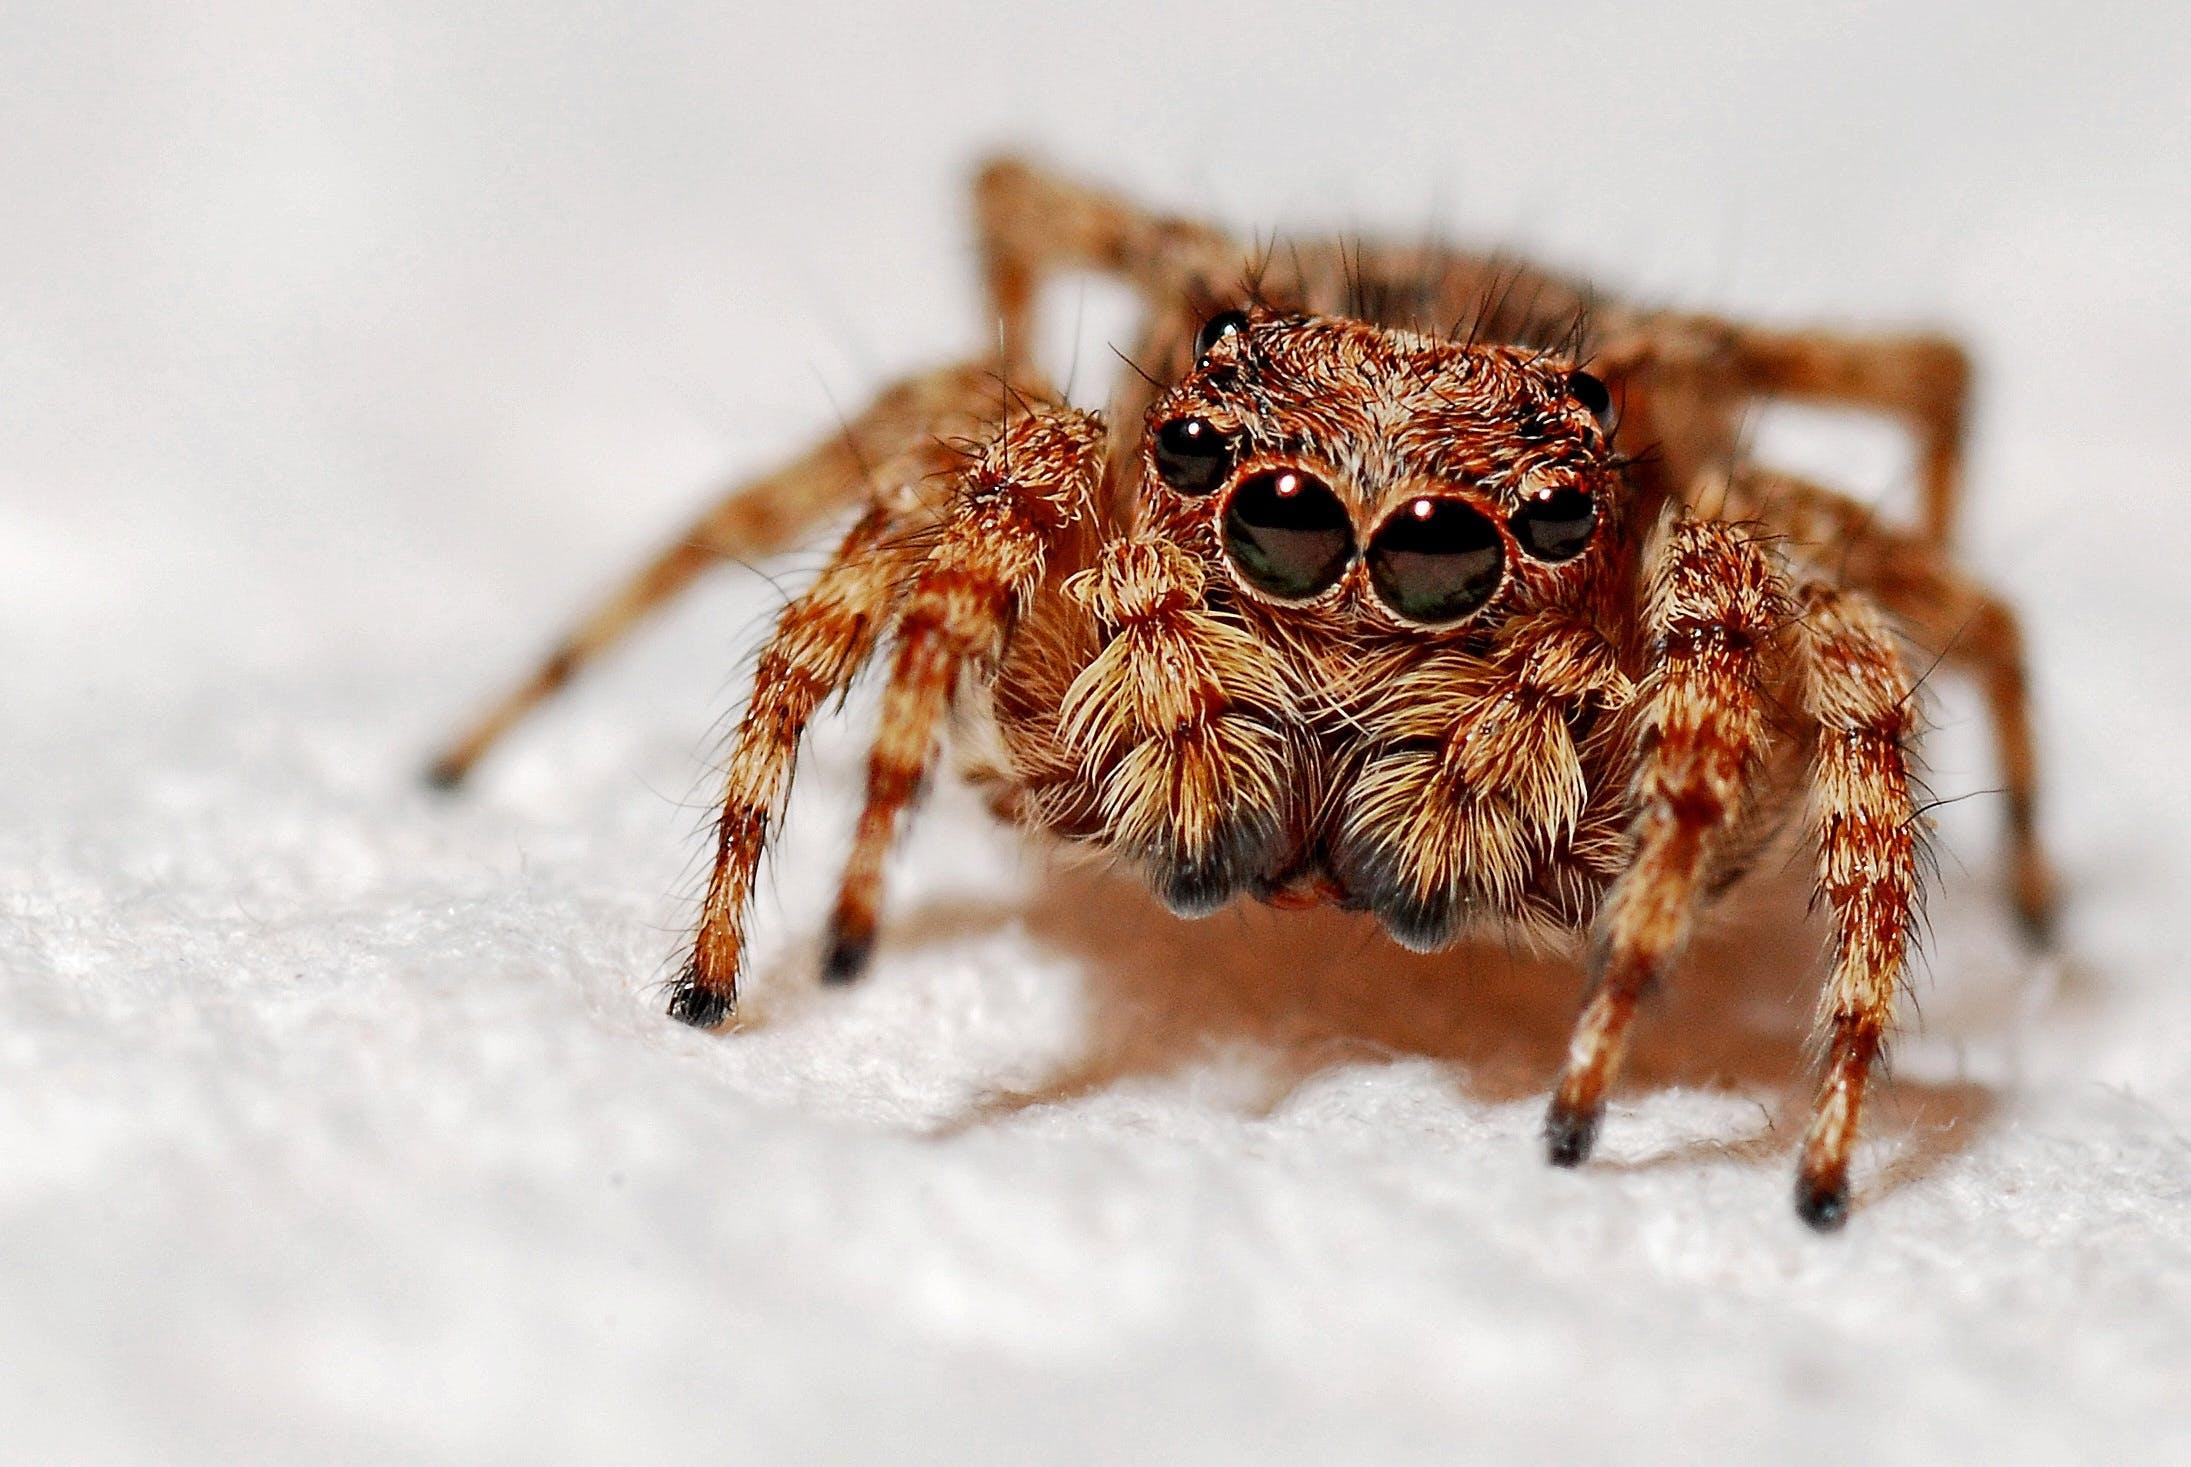 animal, arachnid, arthropod